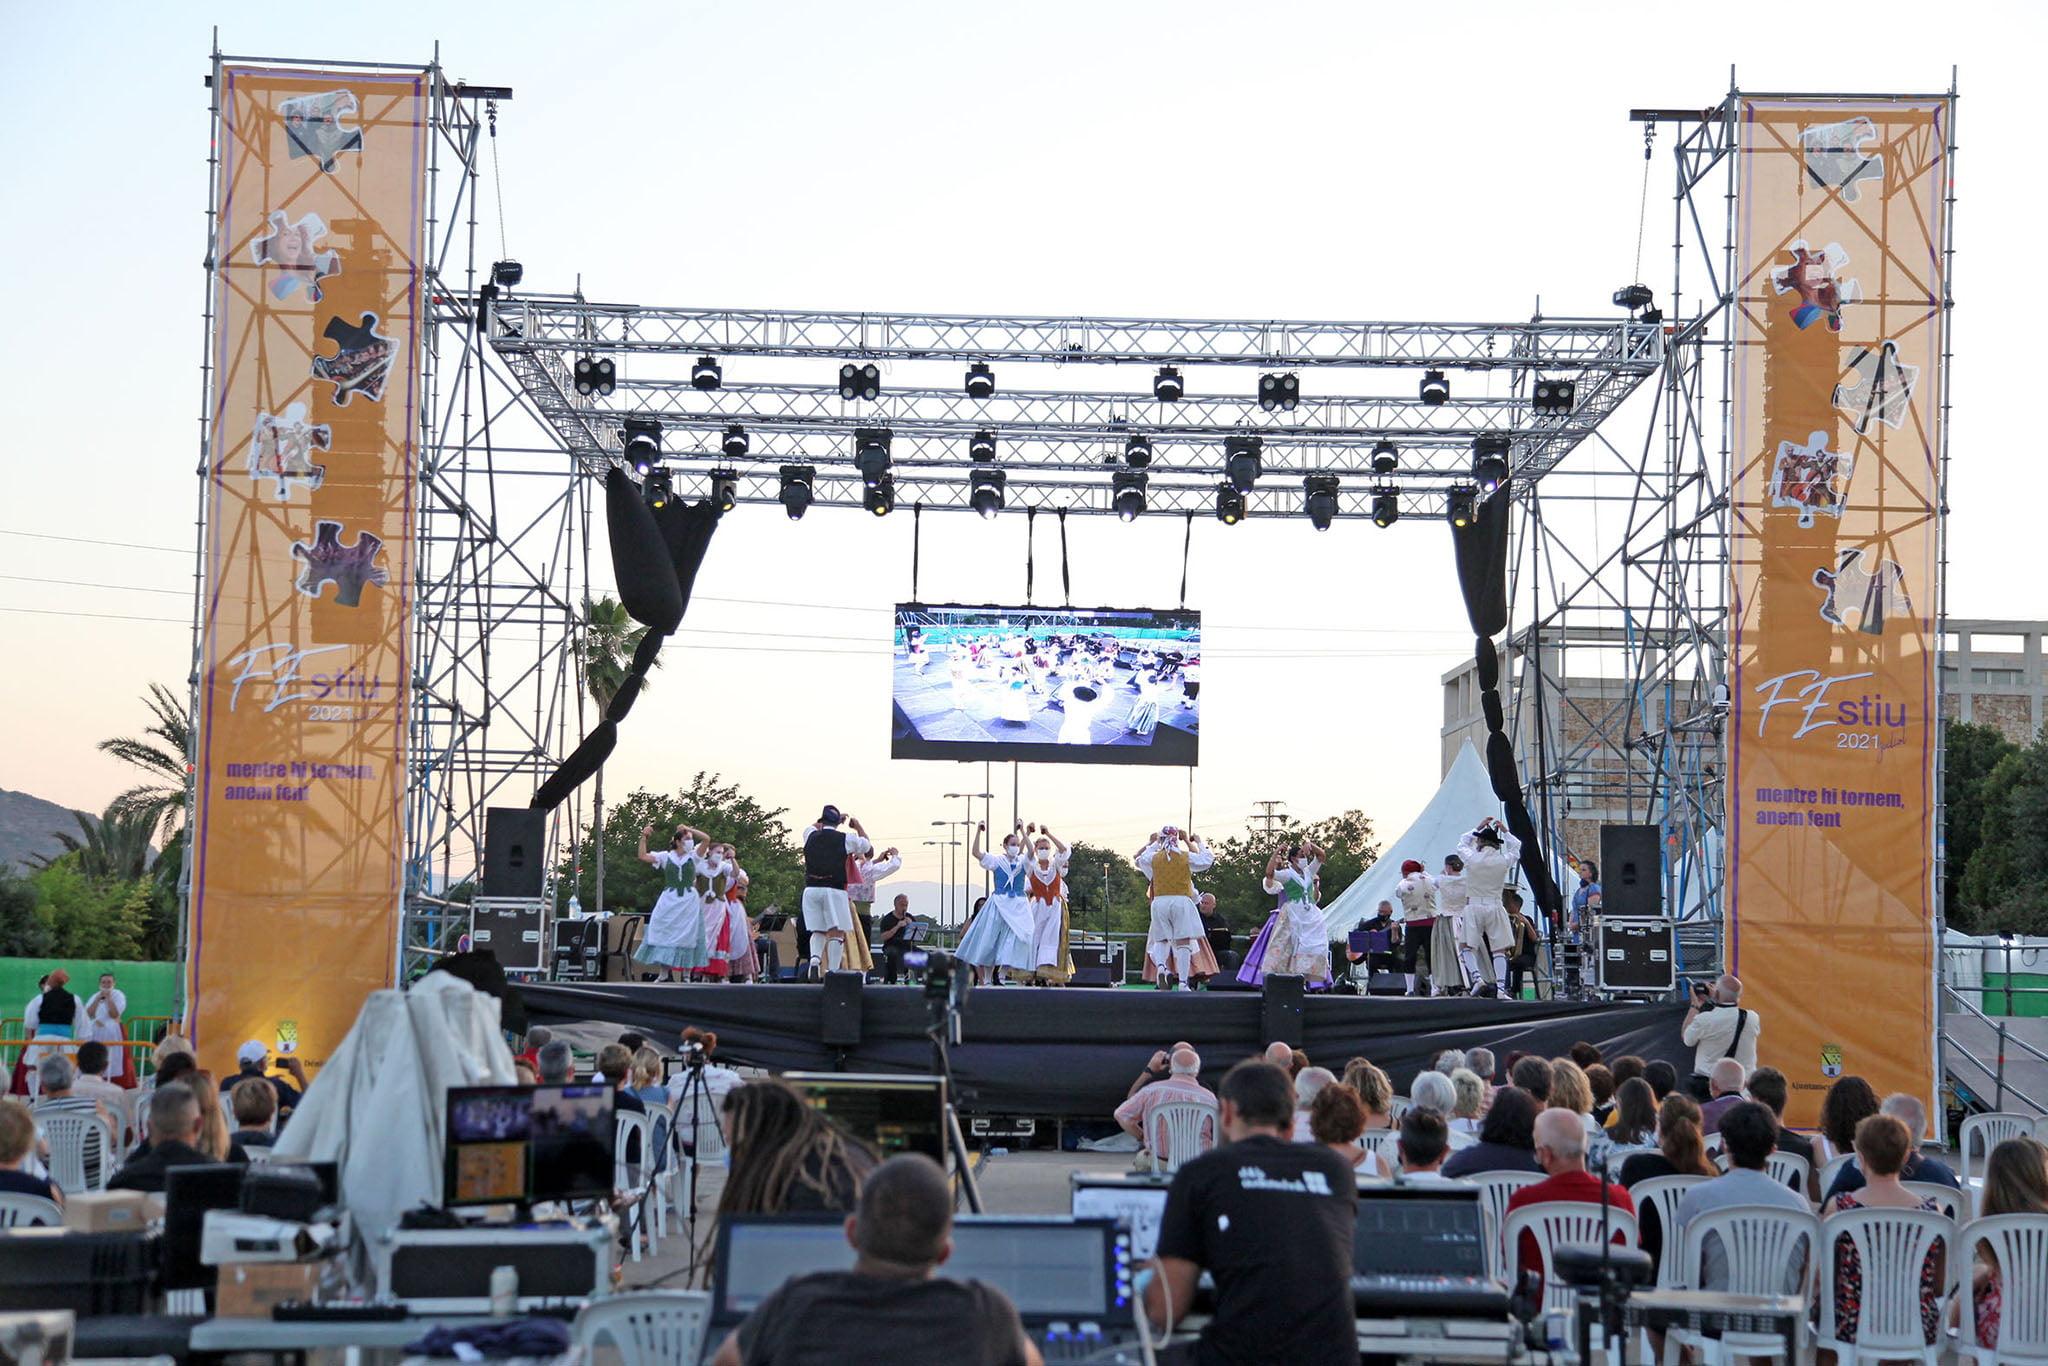 Dianium Dansa organiza el Aplec de Danses 2021 08